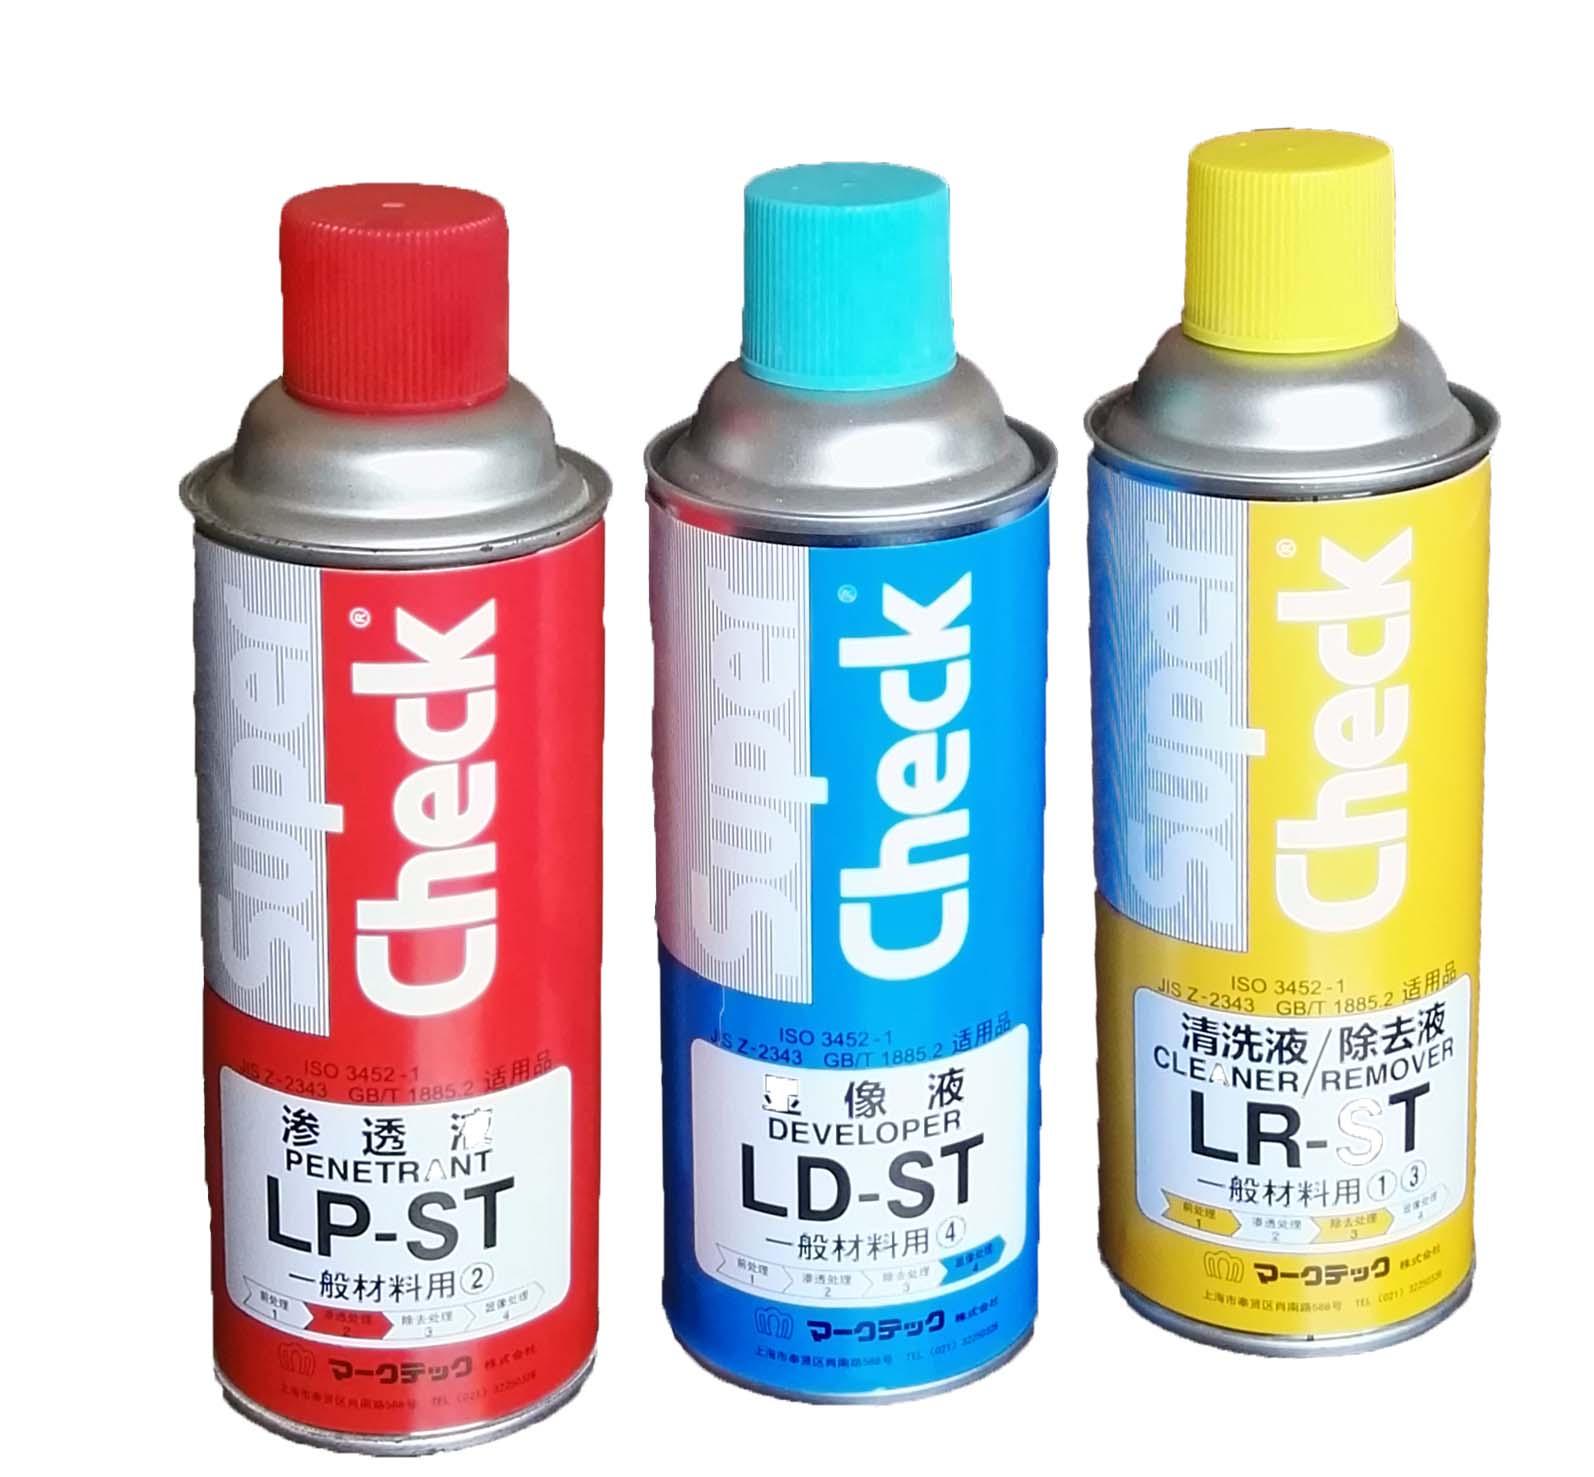 着色渗透探伤剂Super Check L-ST